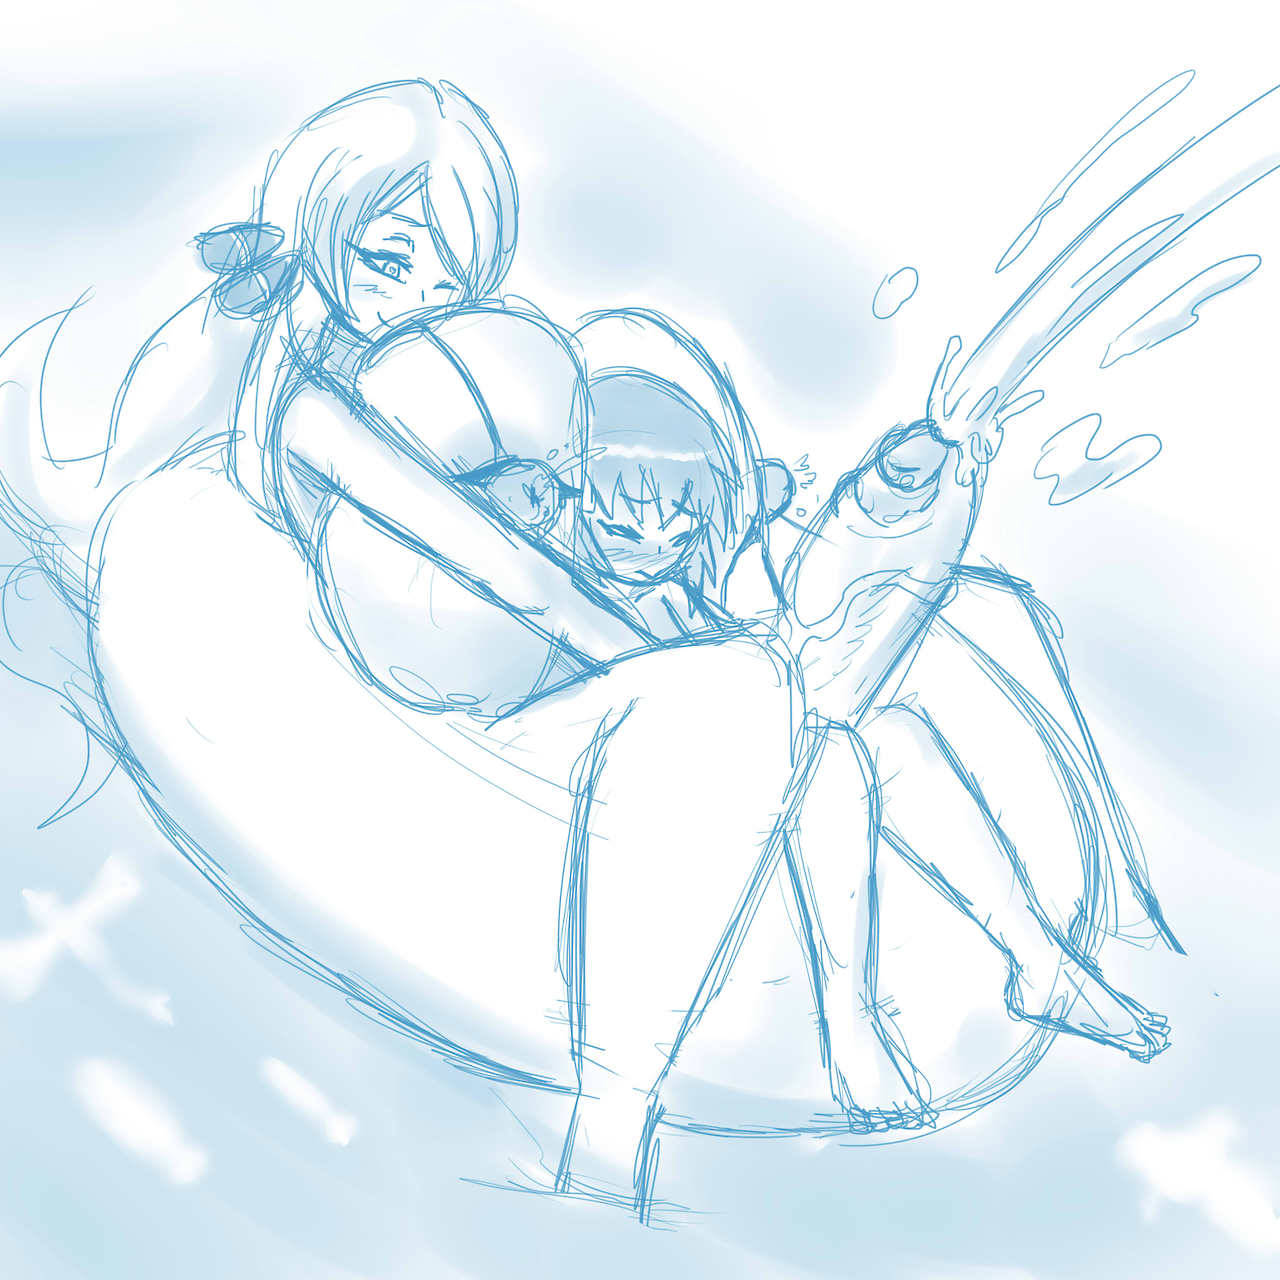 big_breasts bikini blush covered_nipples cum cynthia dawn dawn_(pokemon) futanari futanari_with_female handjob heart heart-shaped_pupils hikari_(pokemon) huge_breasts large_breasts monochrome nikoh one_eye_closed pokemon pokemon_(anime) porkyman shirona_(pokemon) symbol-shaped_pupils water